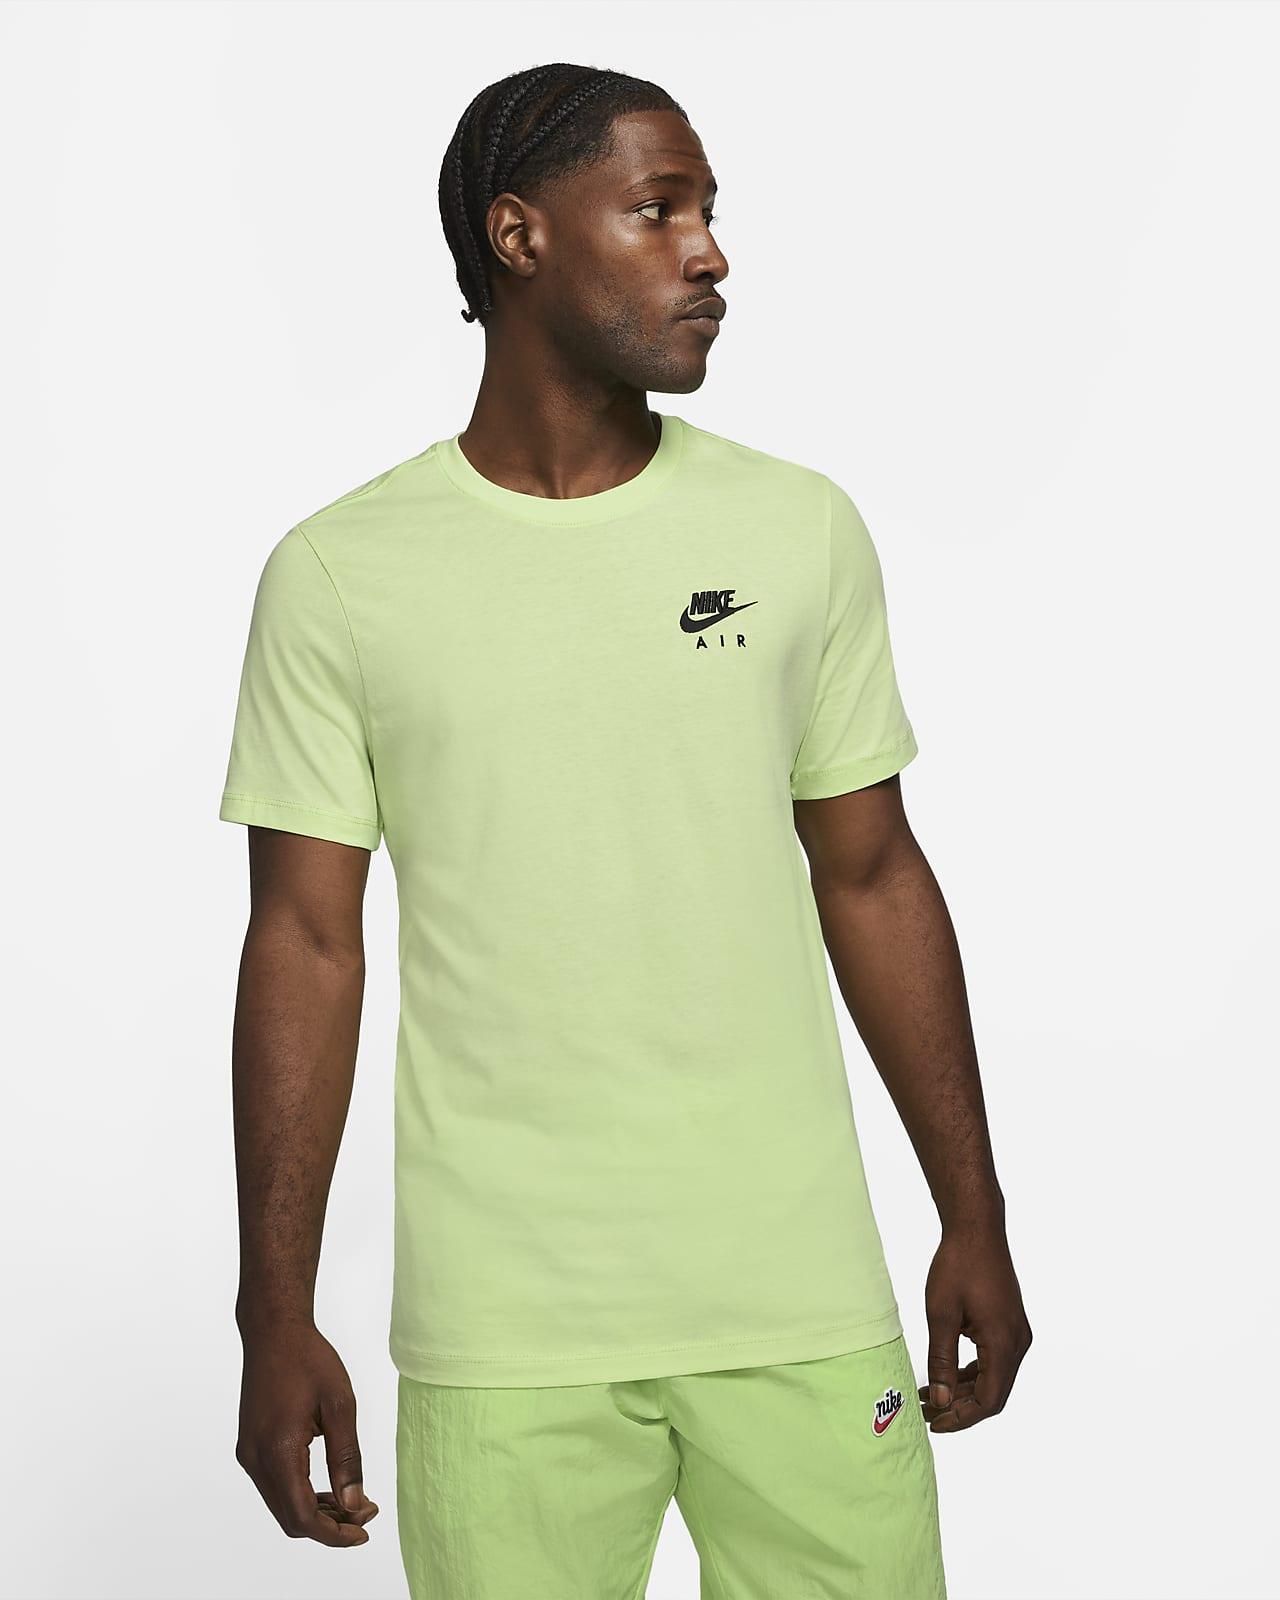 Nike Air Herren-T-Shirt